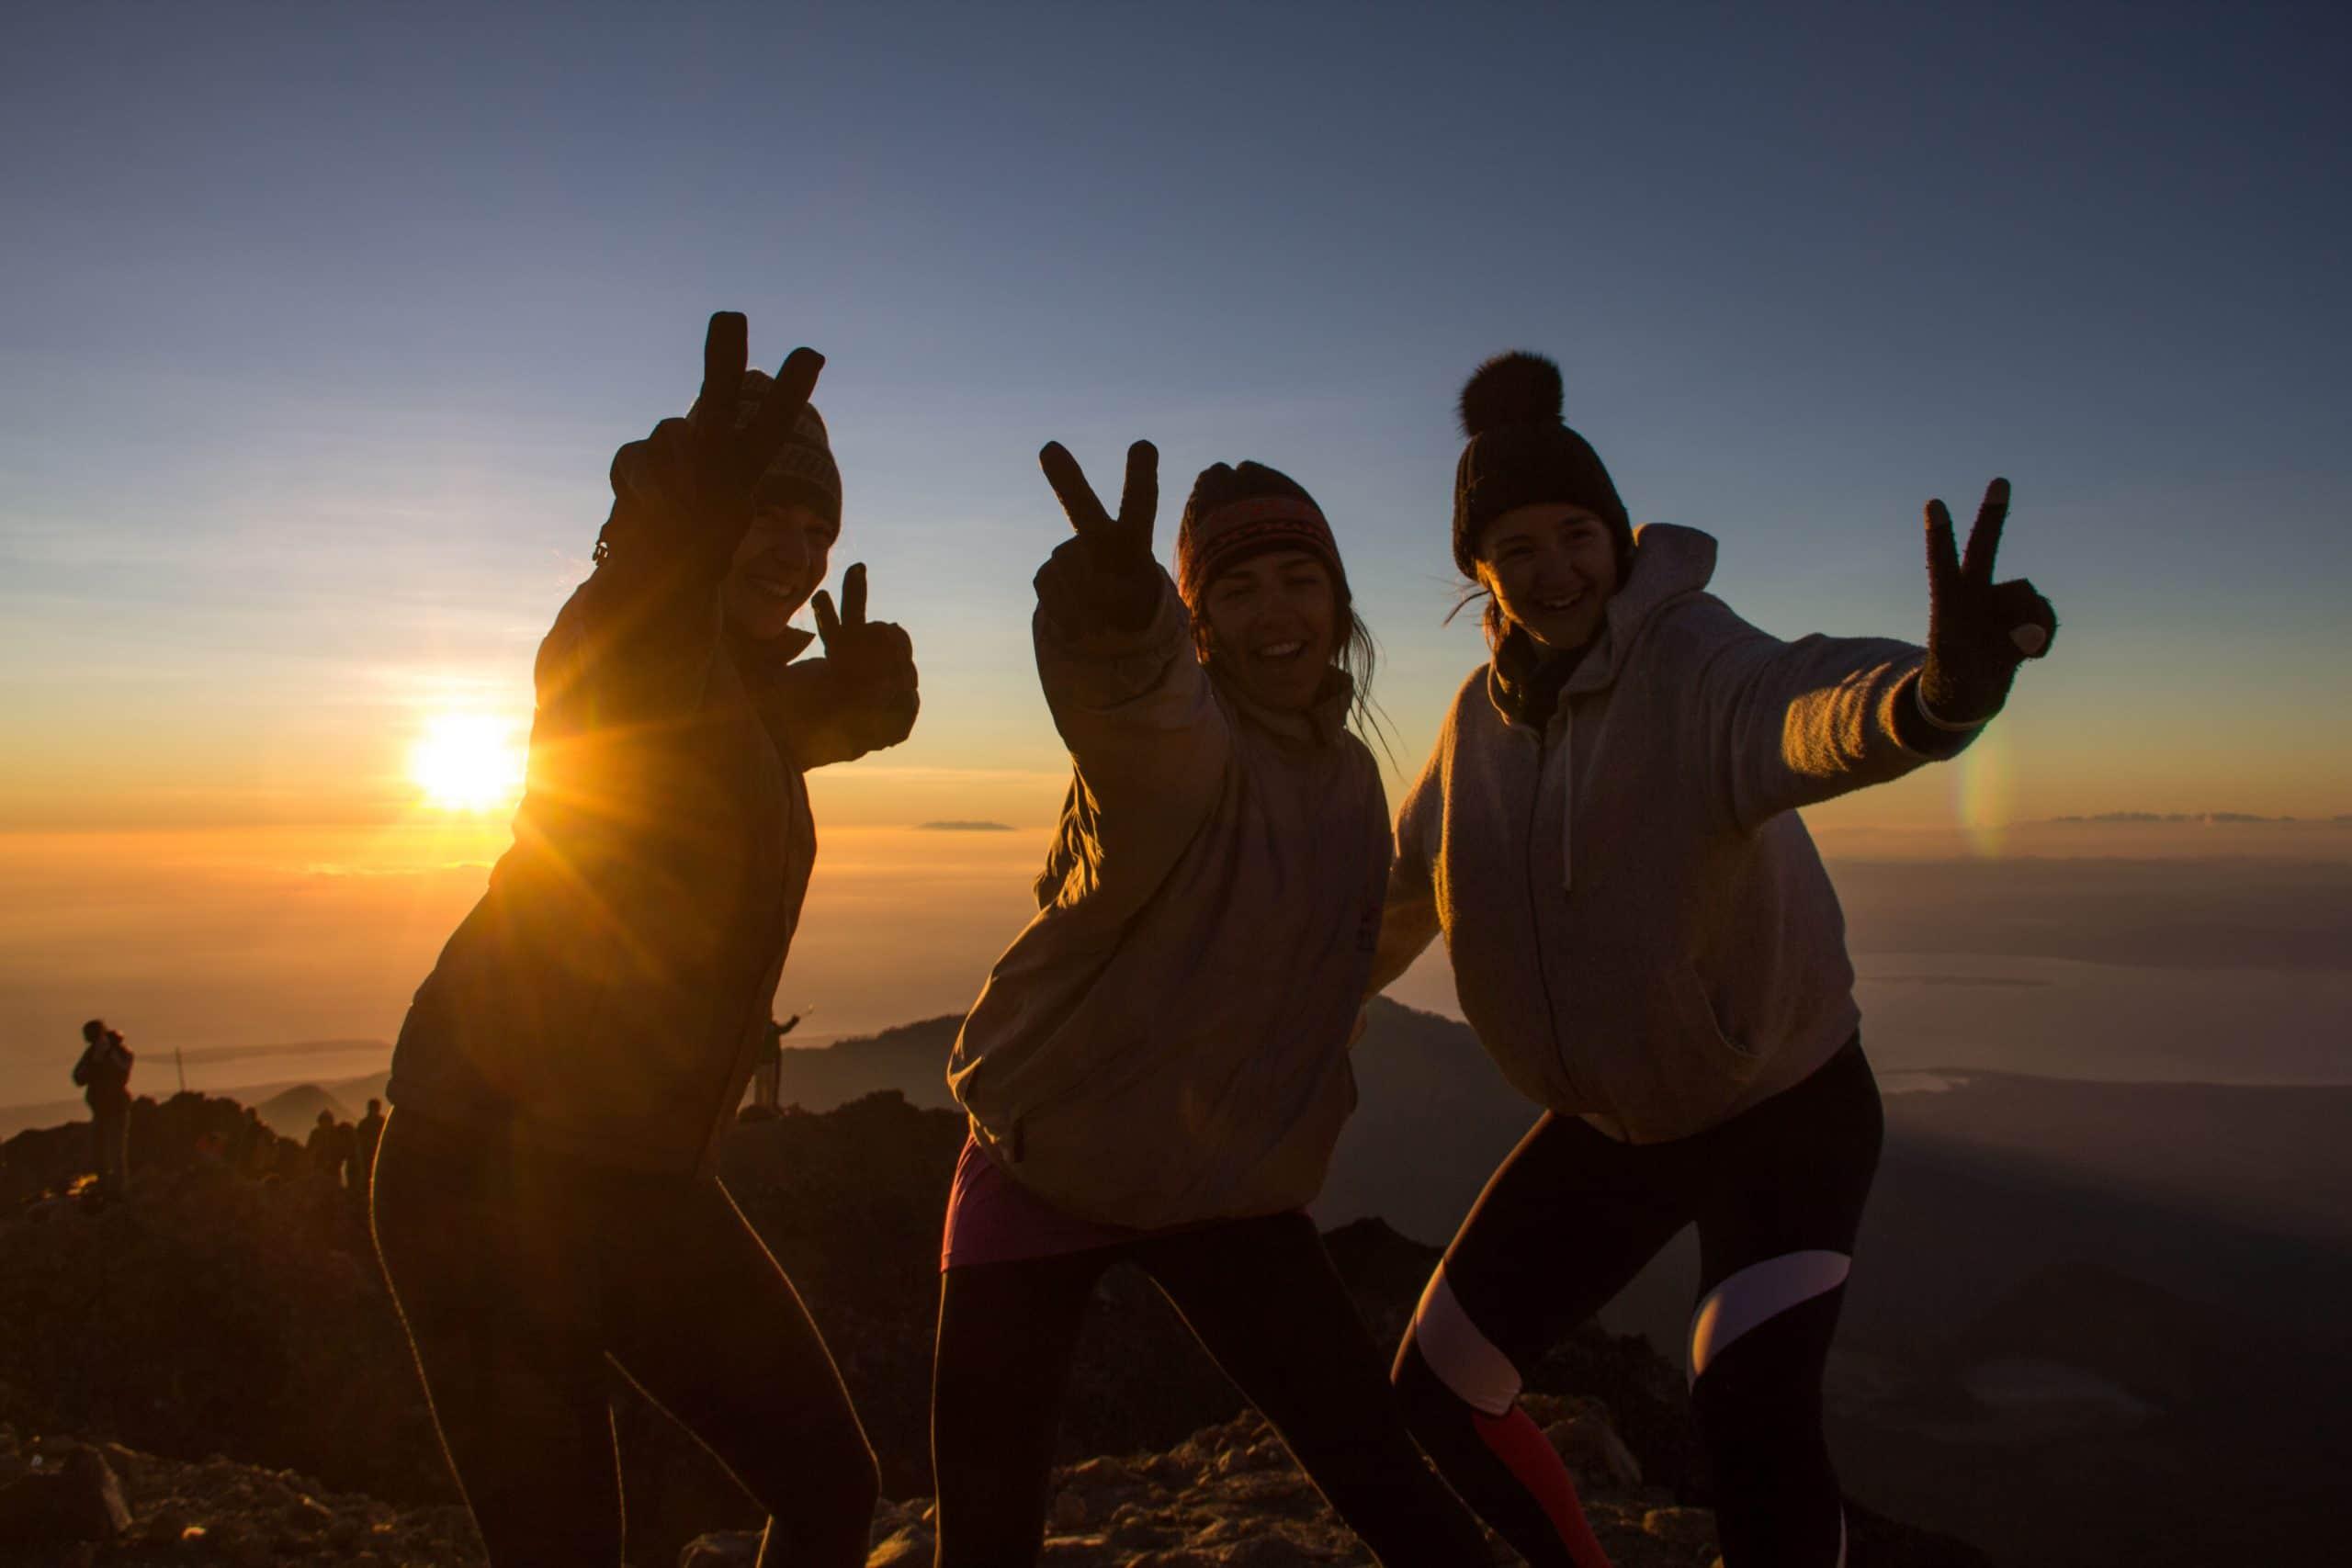 Mount Rinjani Trekking Guide